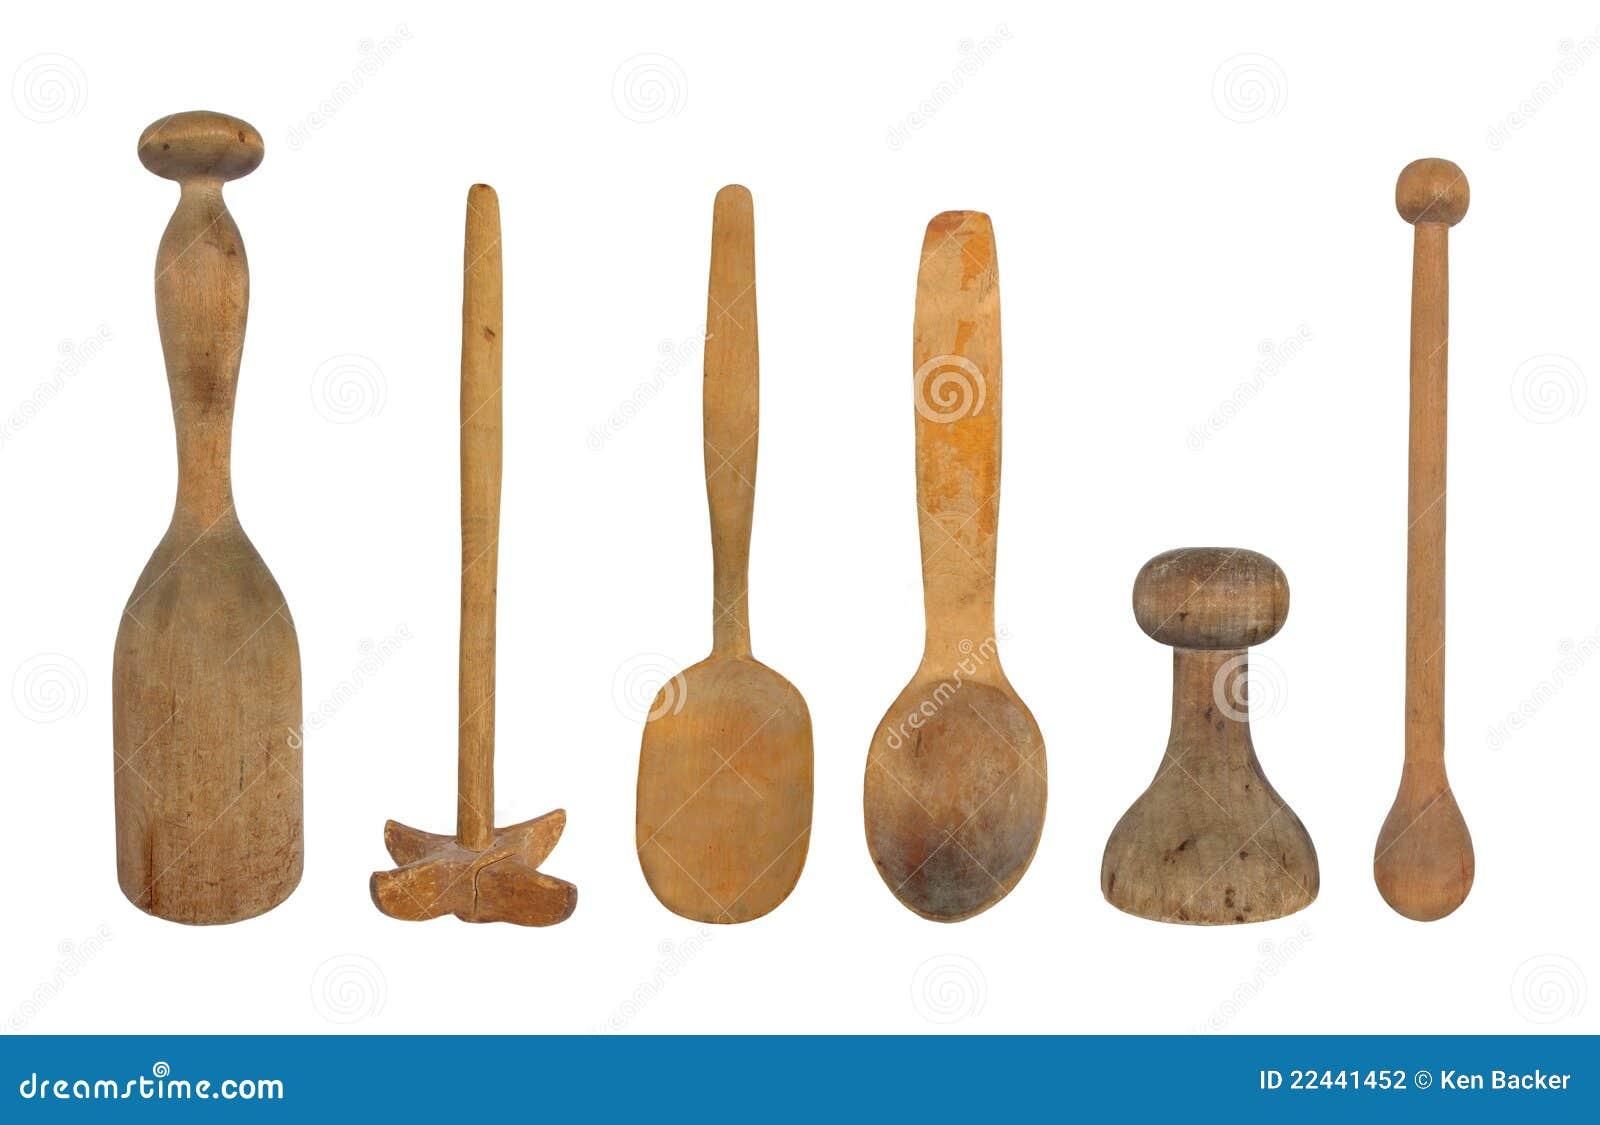 Antique kitchen tools utensils bing images for Wooden kitchen utensils